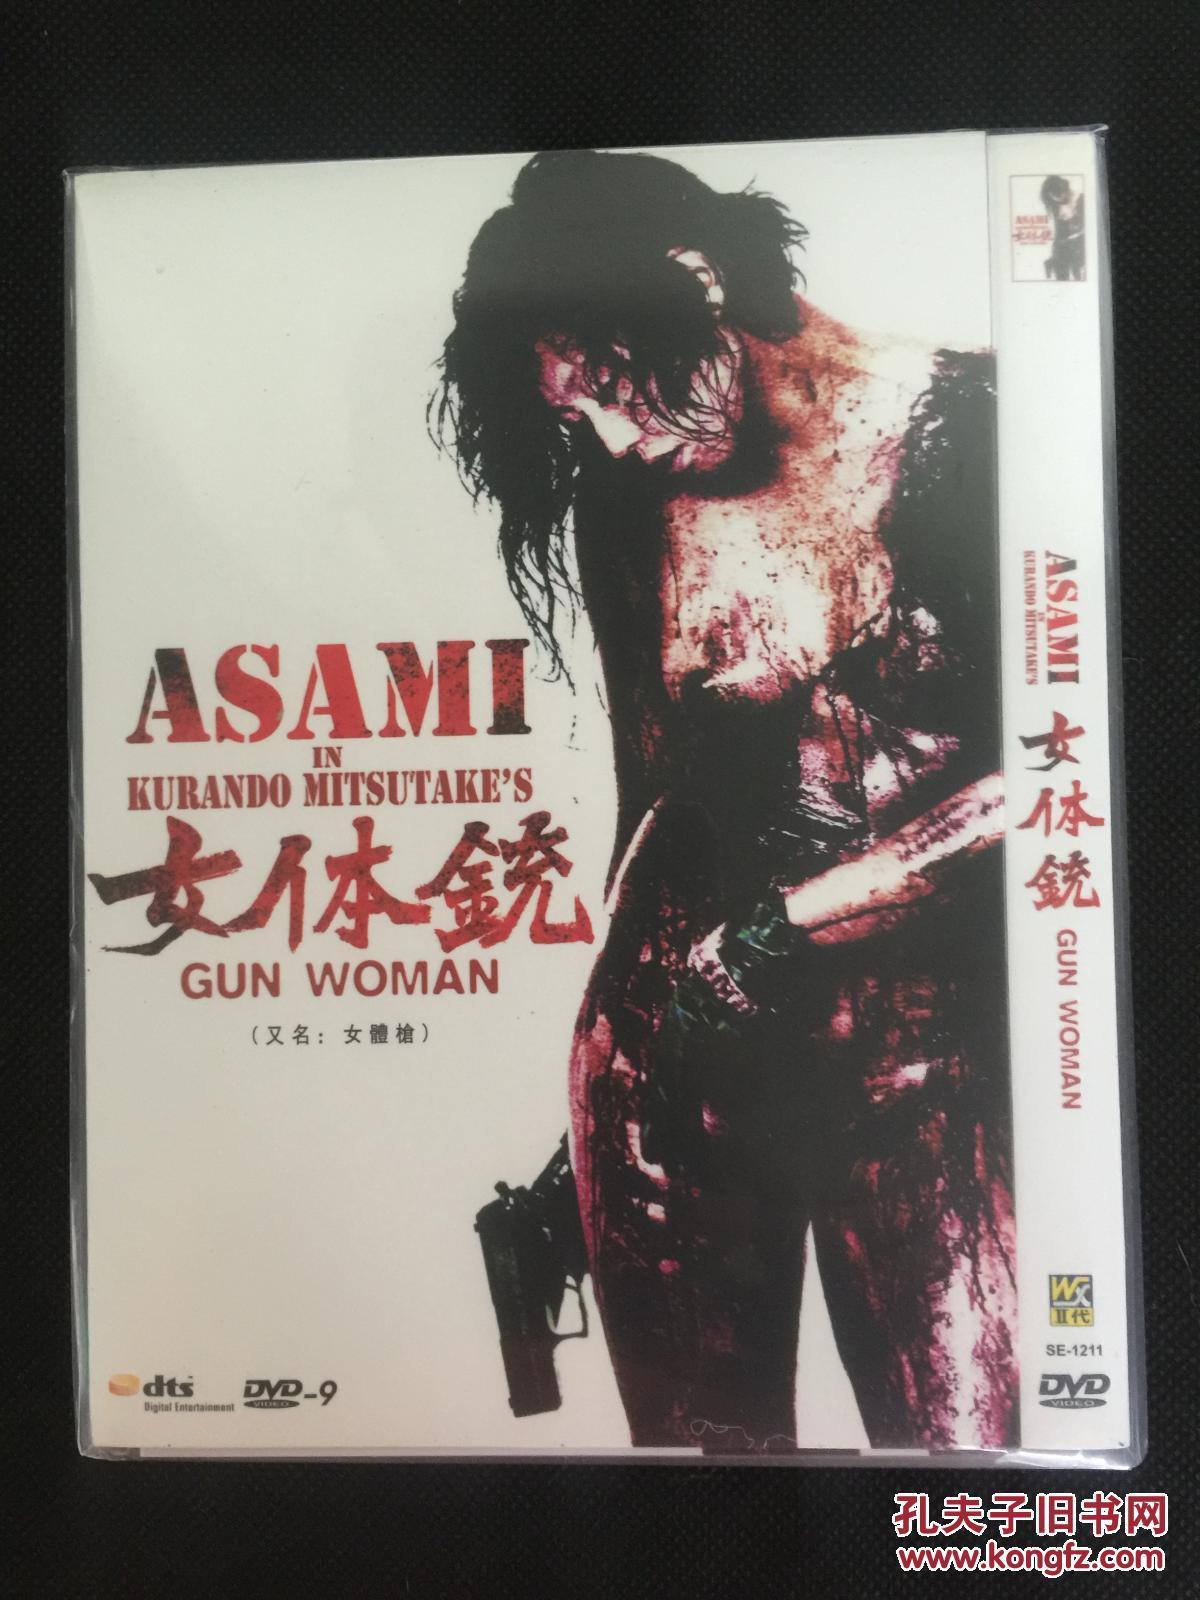 女���*:!&���&d9�-�`_【d9日本片 光武藏人】女体铳 女体铳 ガンウ`マン gun woman (2014)